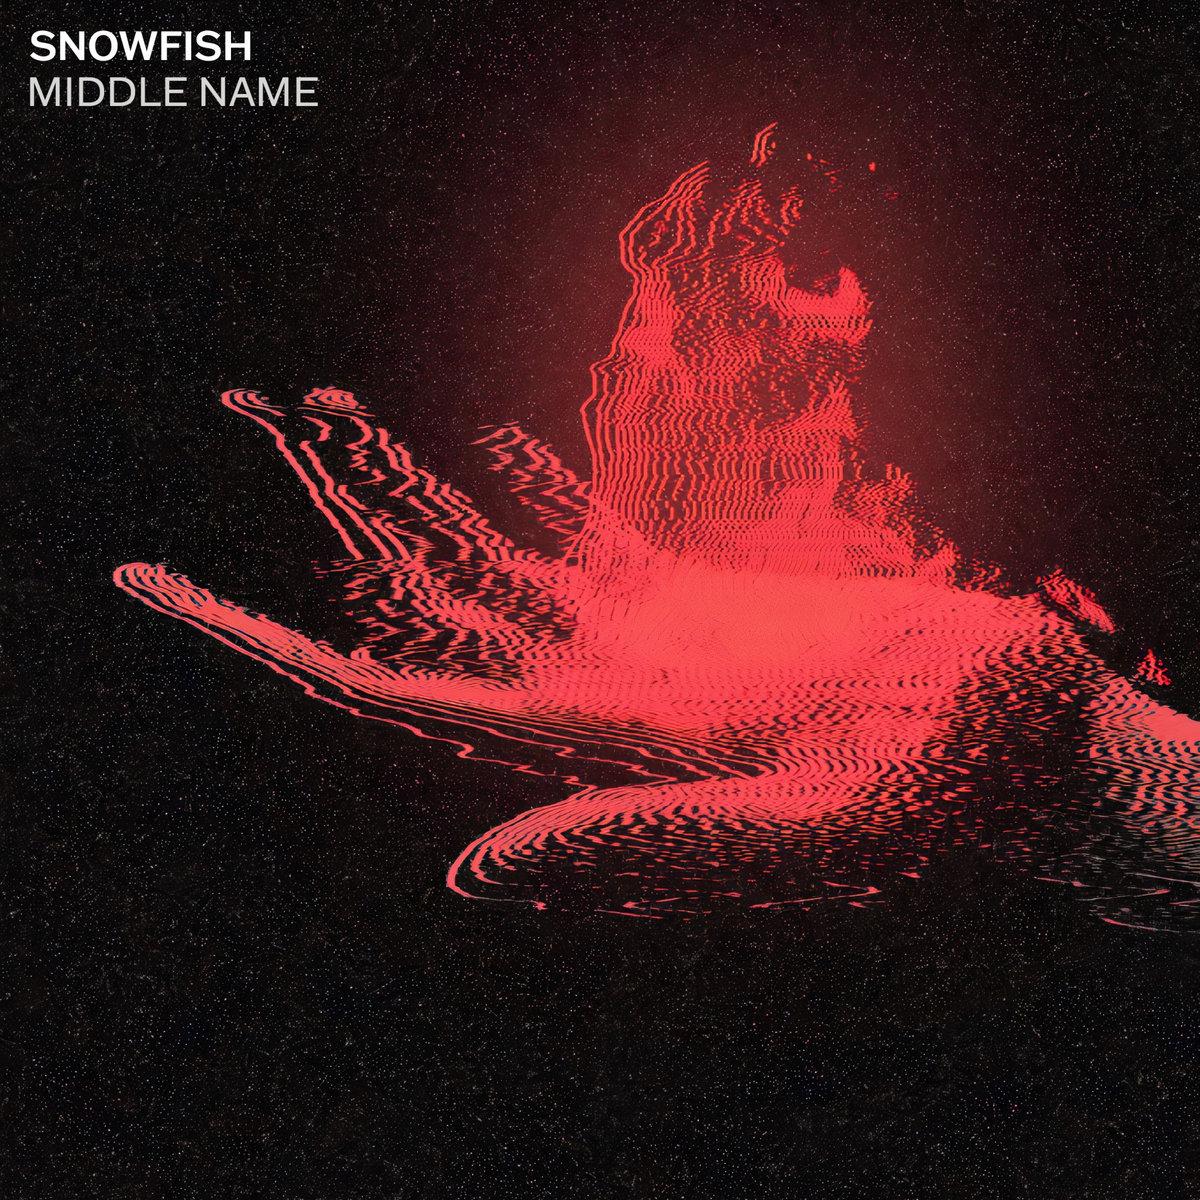 www.facebook.com/snowfishband